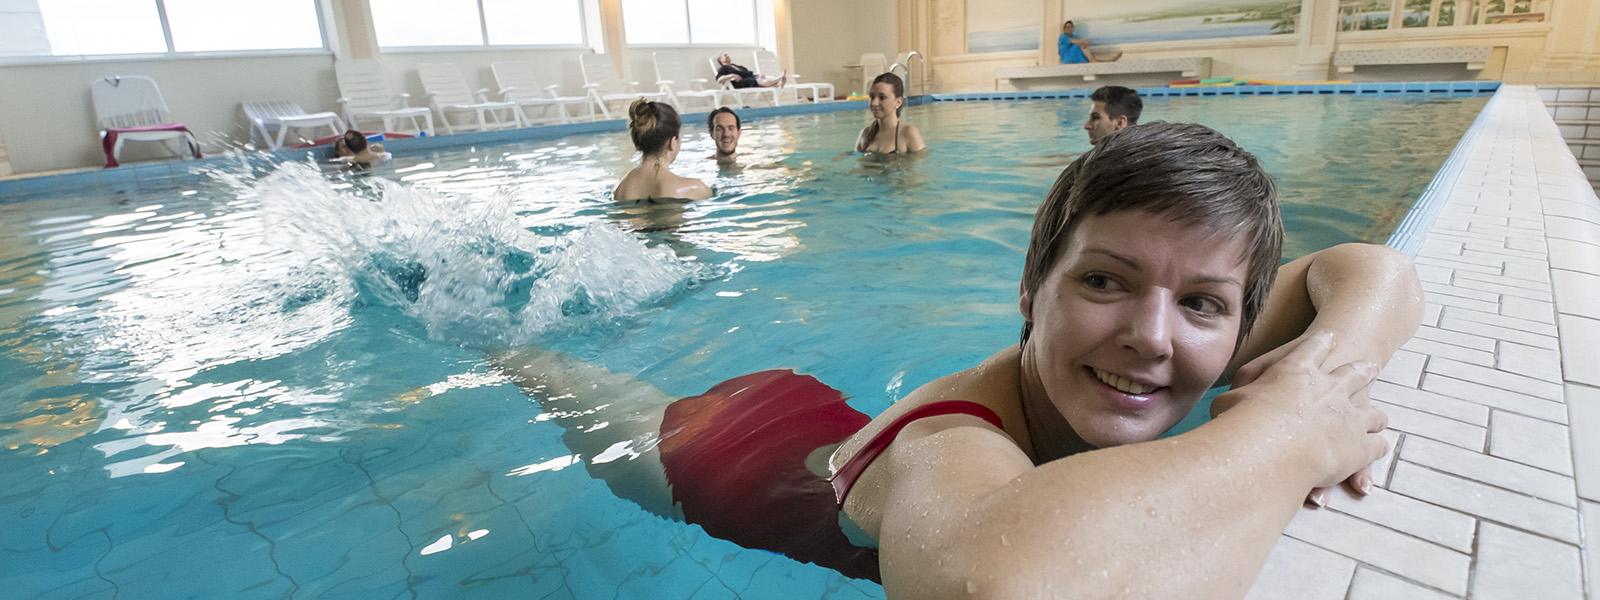 Schwimmbad02_16x6